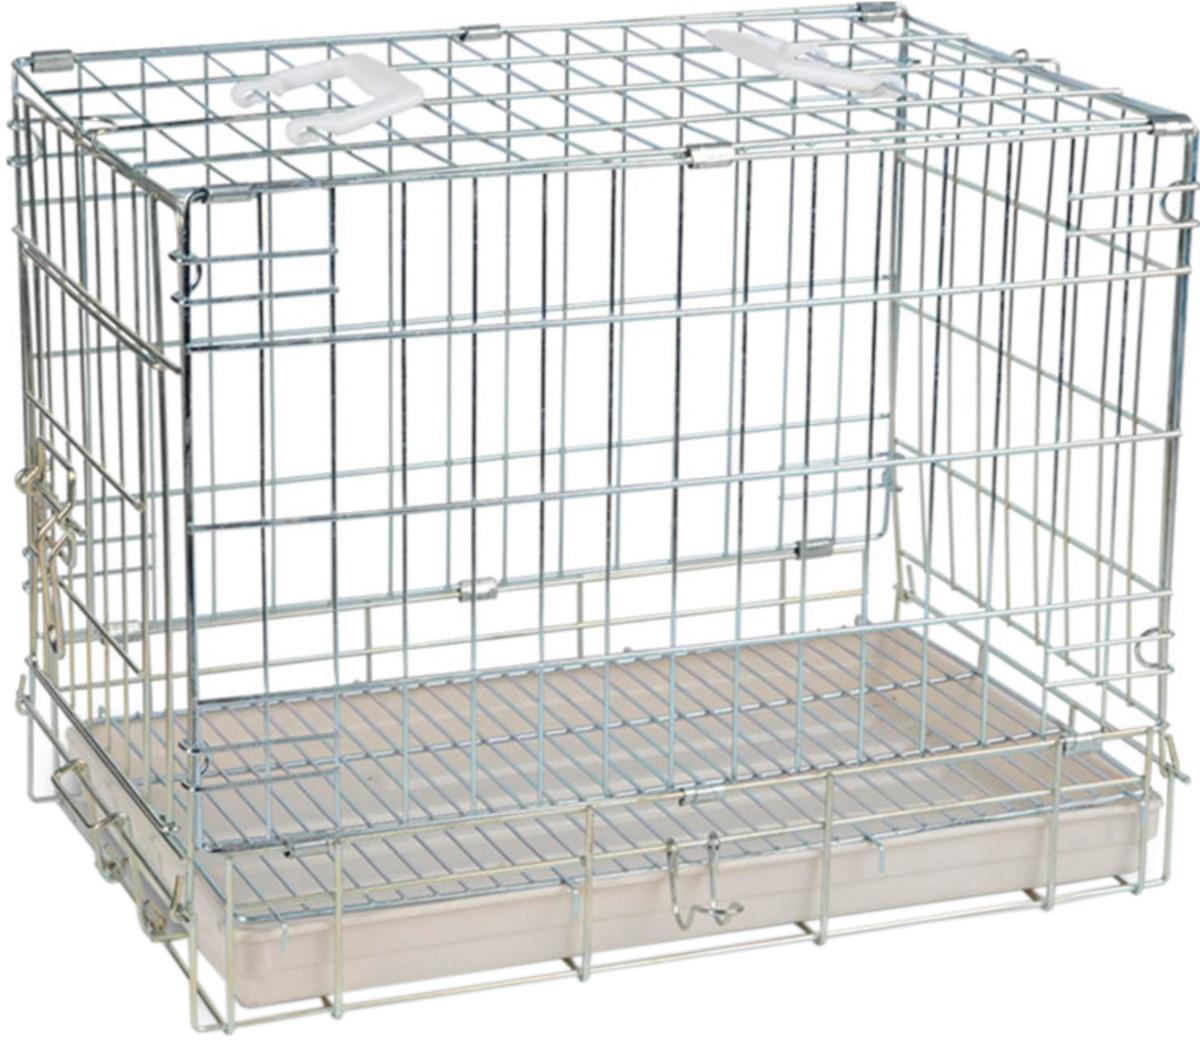 Клетка для животных Triol 003z цинк 77 х 56 х 64 см (1 шт) переноска для животных triol premium large 80 1 х 56 2 х 59 см 1 шт